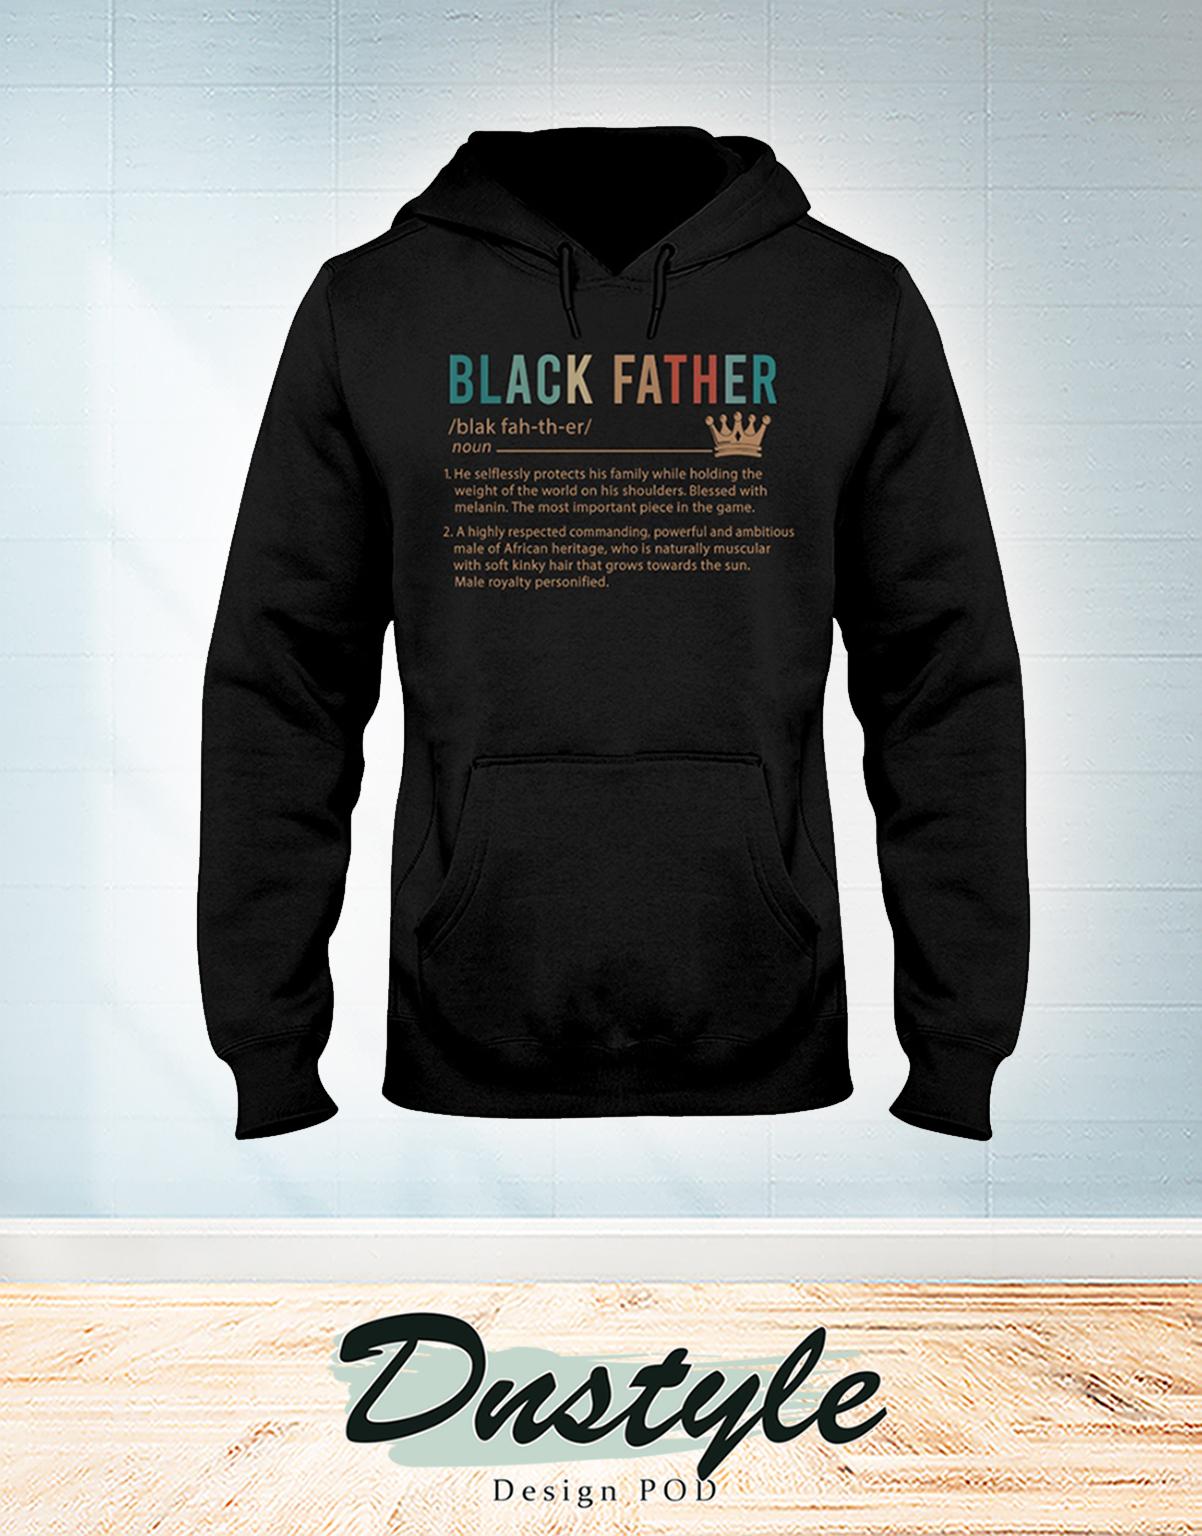 Vintage Black father definition hoodie